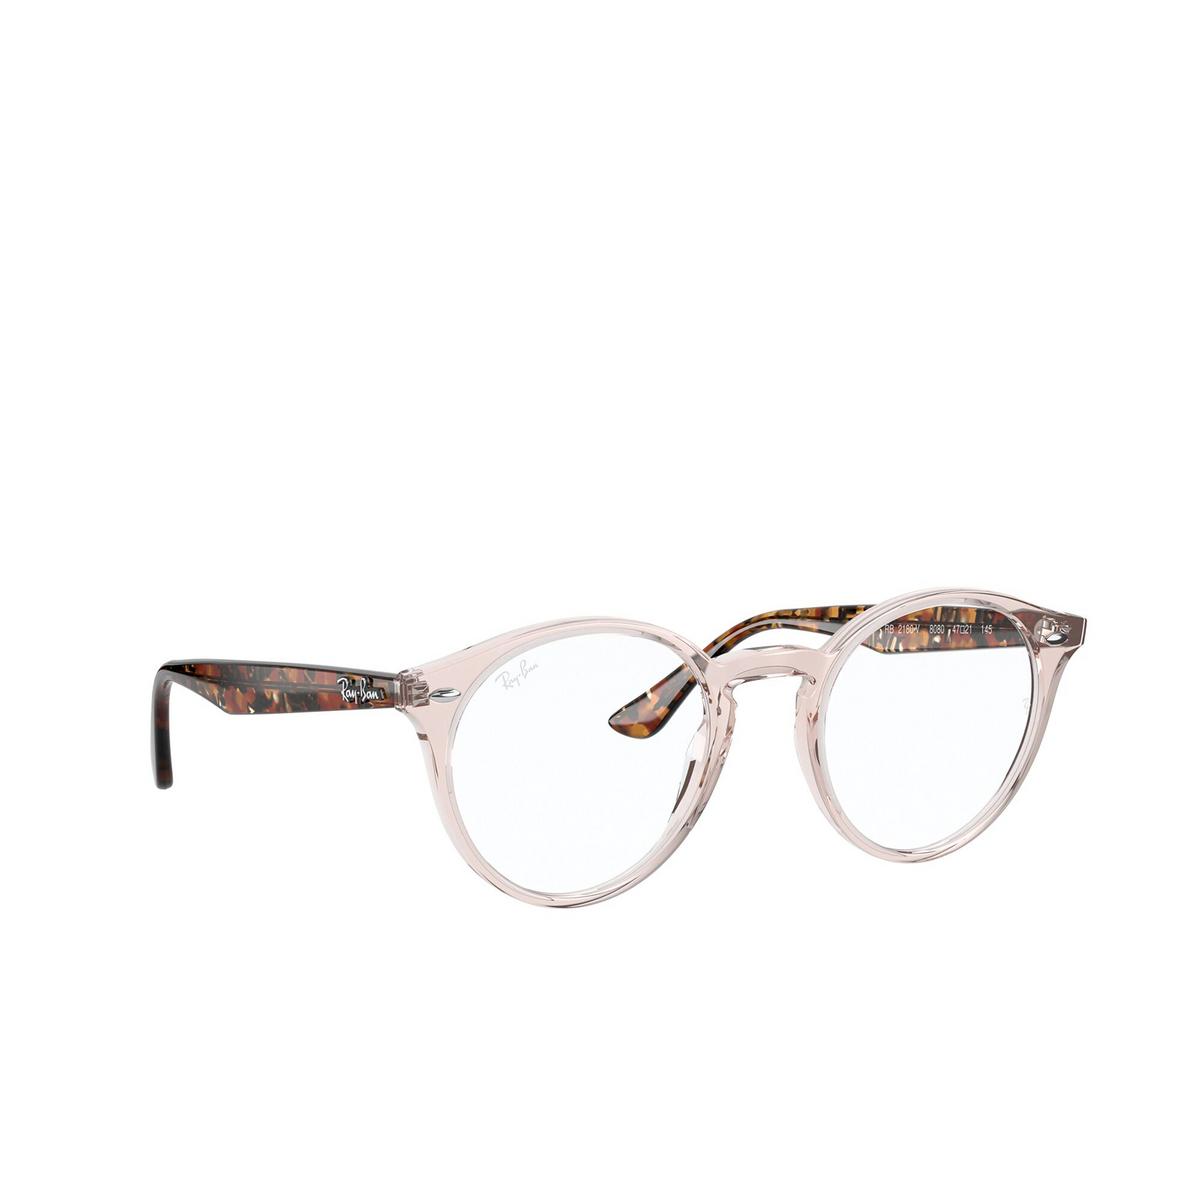 Ray-Ban® Round Eyeglasses: RX2180V color Transparent Light Brown 8080 - three-quarters view.